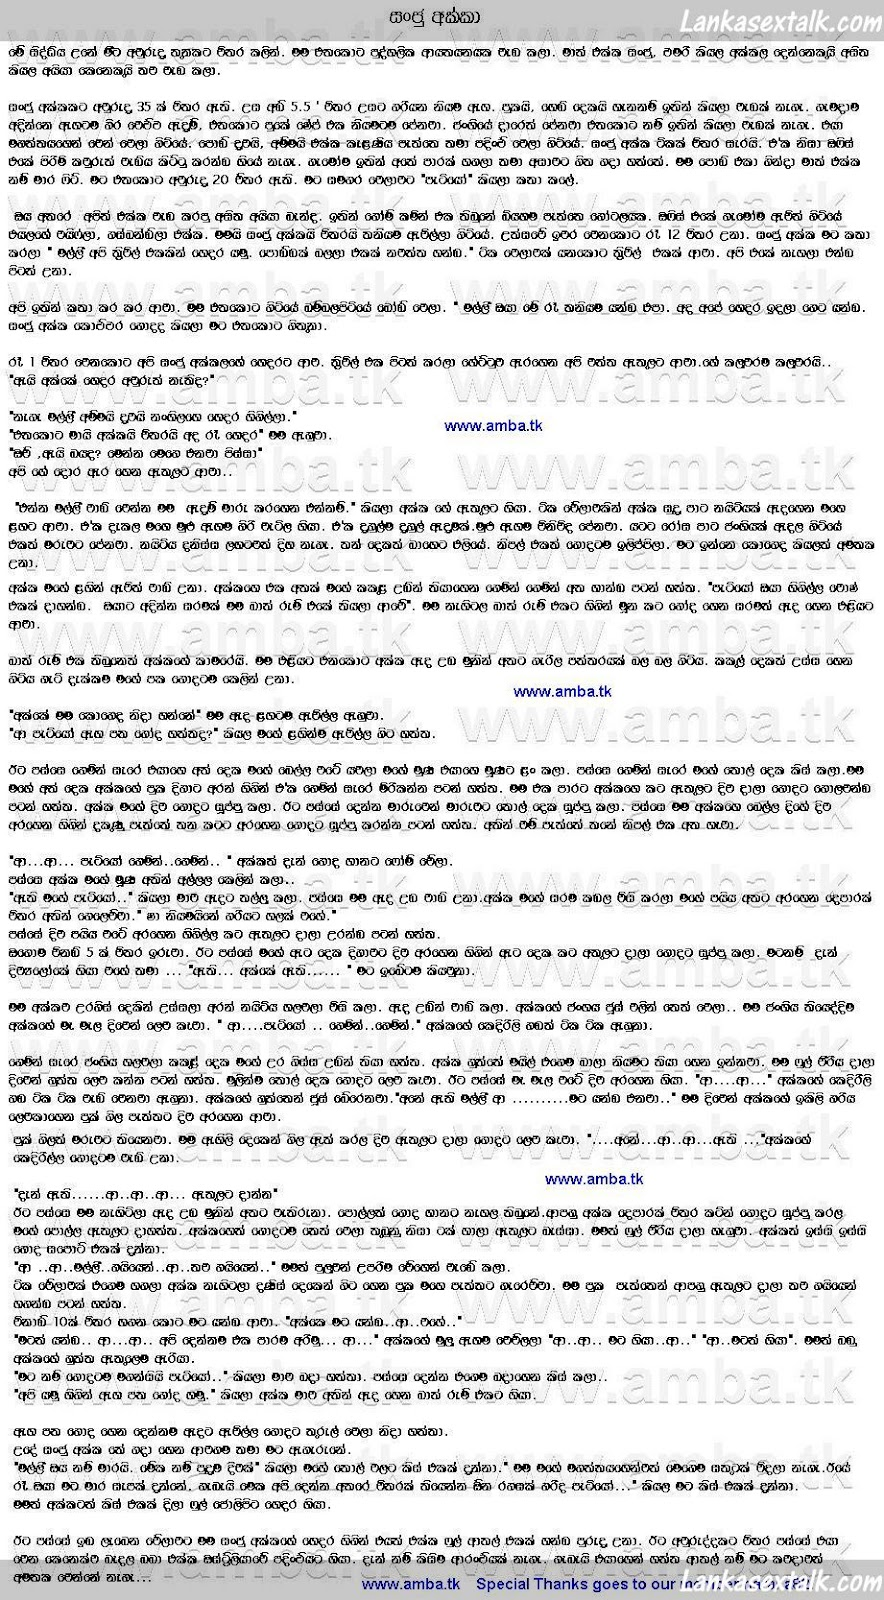 Sinhala wal katha hot sinhala niliyo 713 x 638 85 kb jpeg wela katha